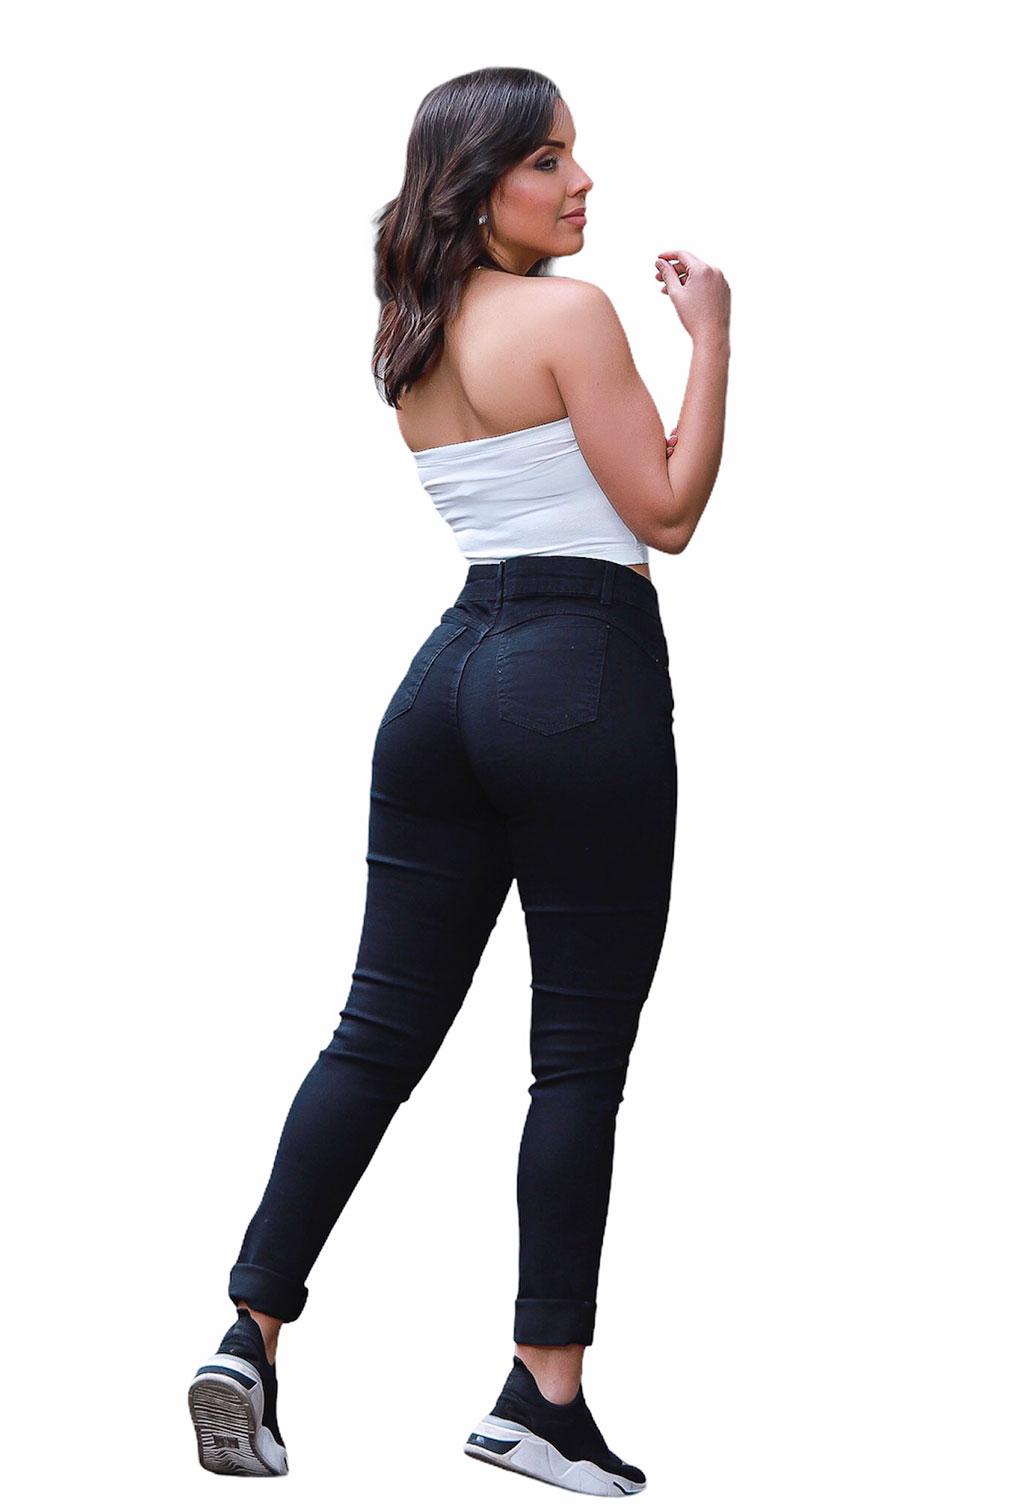 Calça Jeans Feminina Cintura Alta Básica Preta  - ModaStore | Moda Feminina